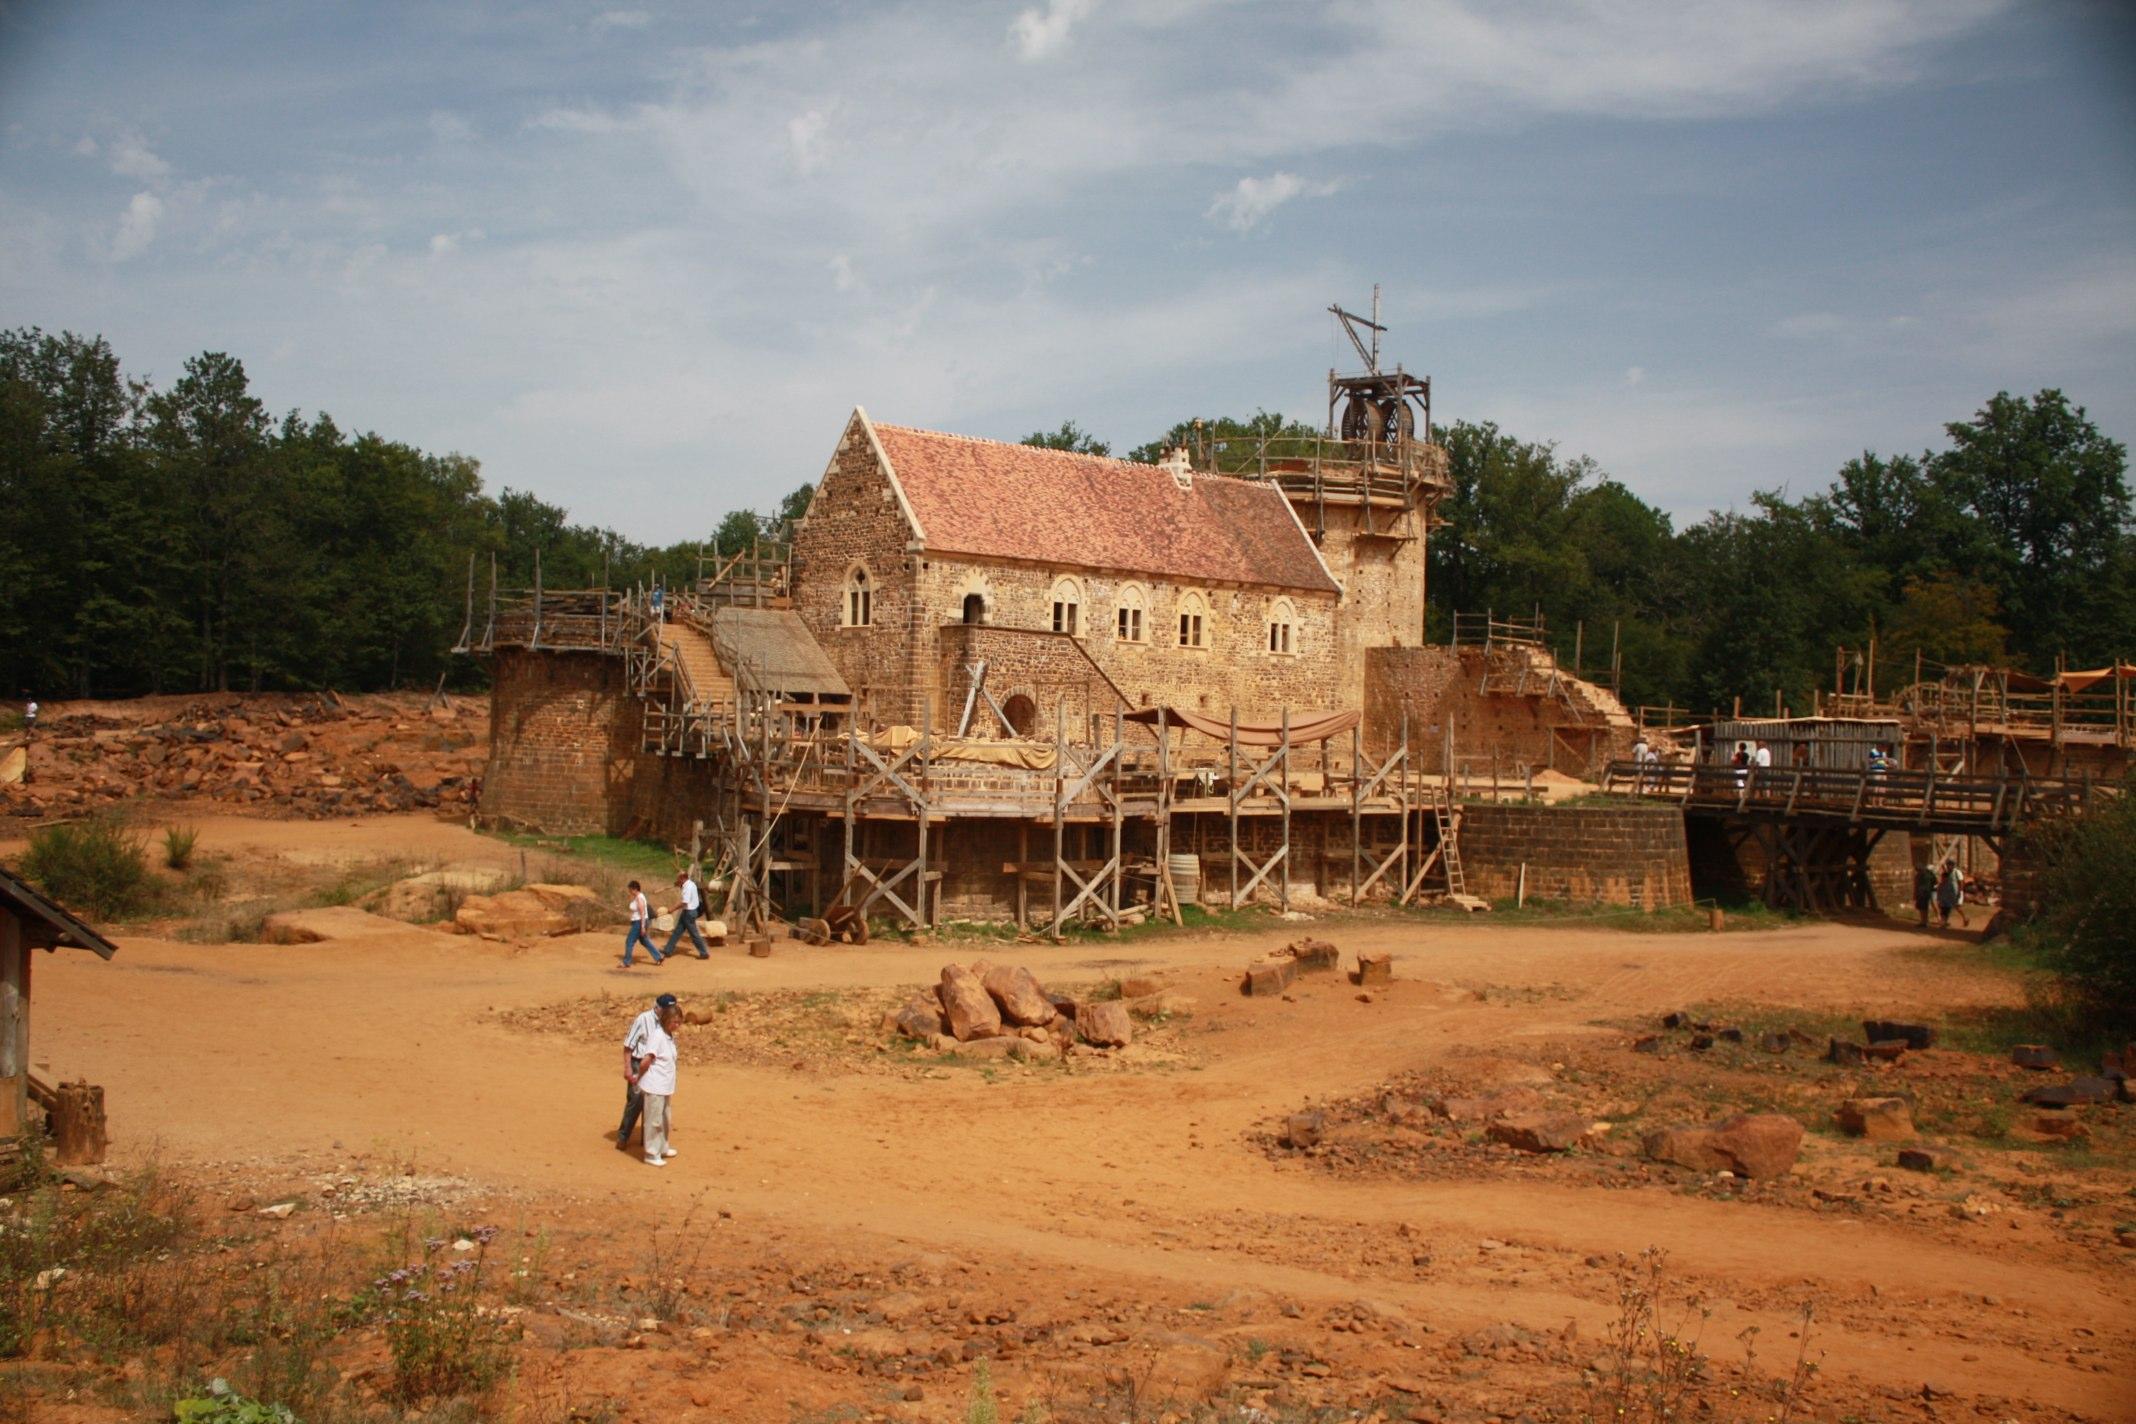 File:Château de Guédelon (août 2012).jpg - Wikimedia Commons